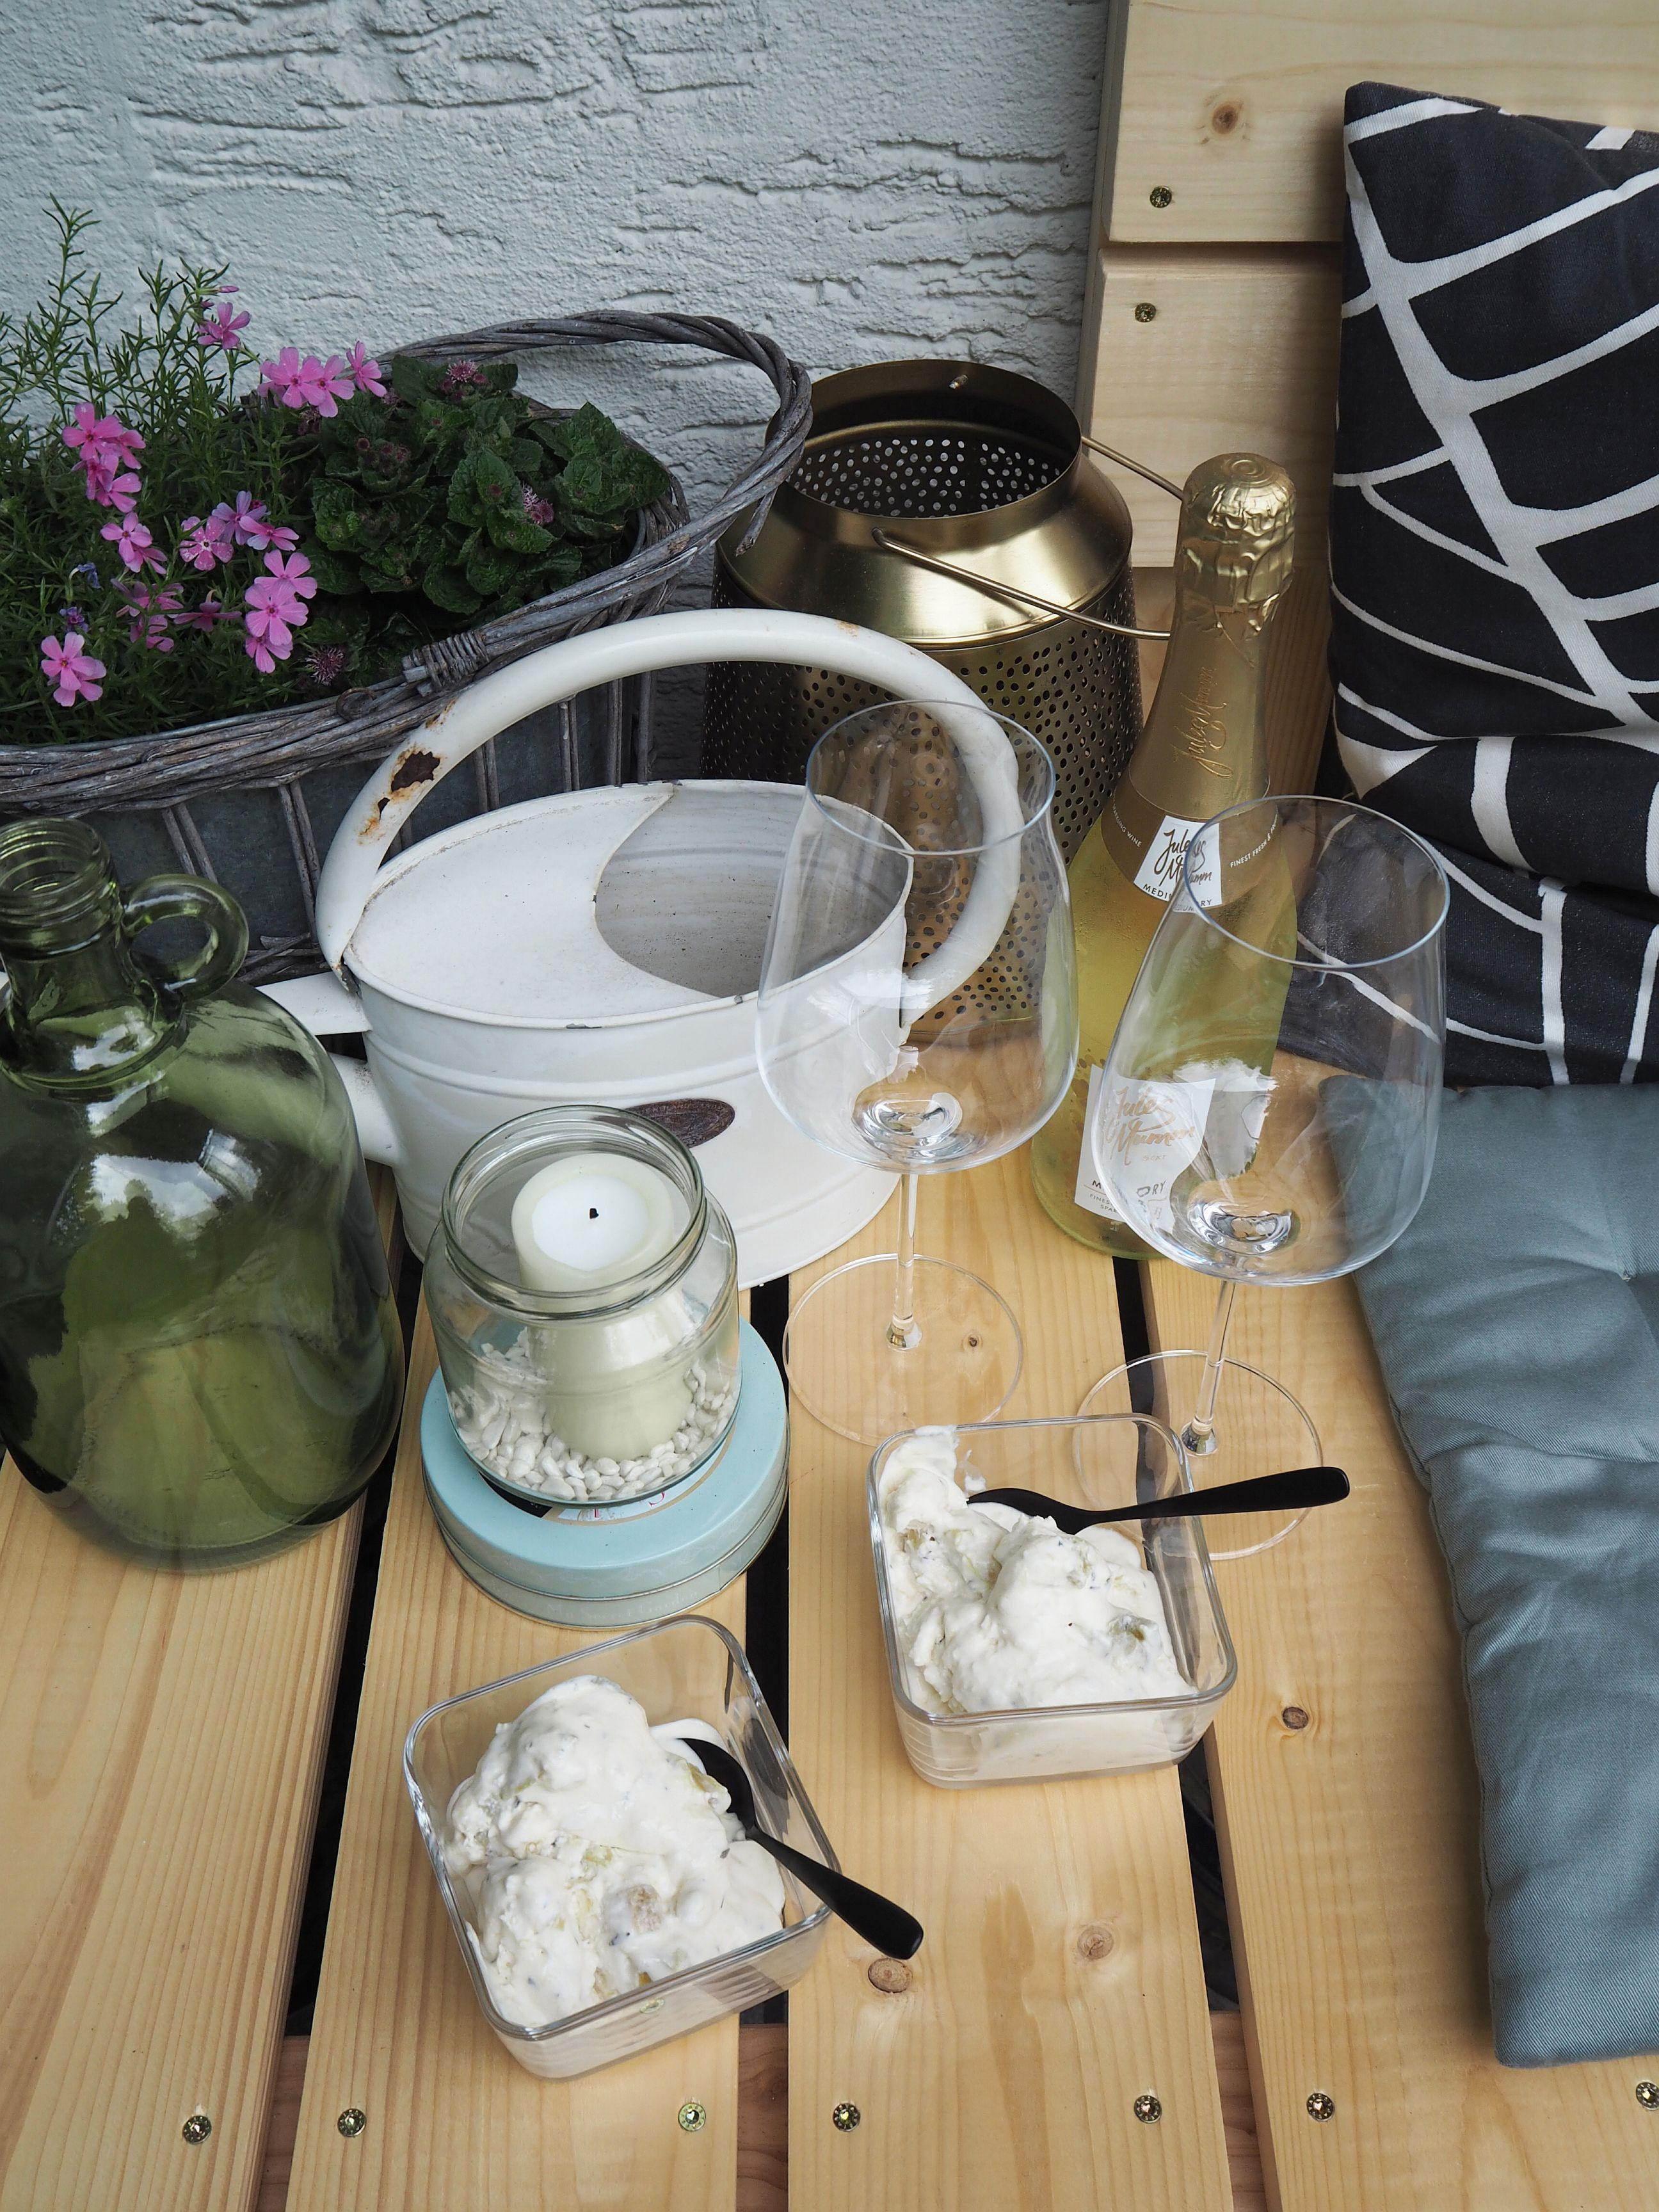 2018-06-skoen-och-kreativ-food-midsommar-rhabarber-cheesecake-eis-mit-thymian (3)